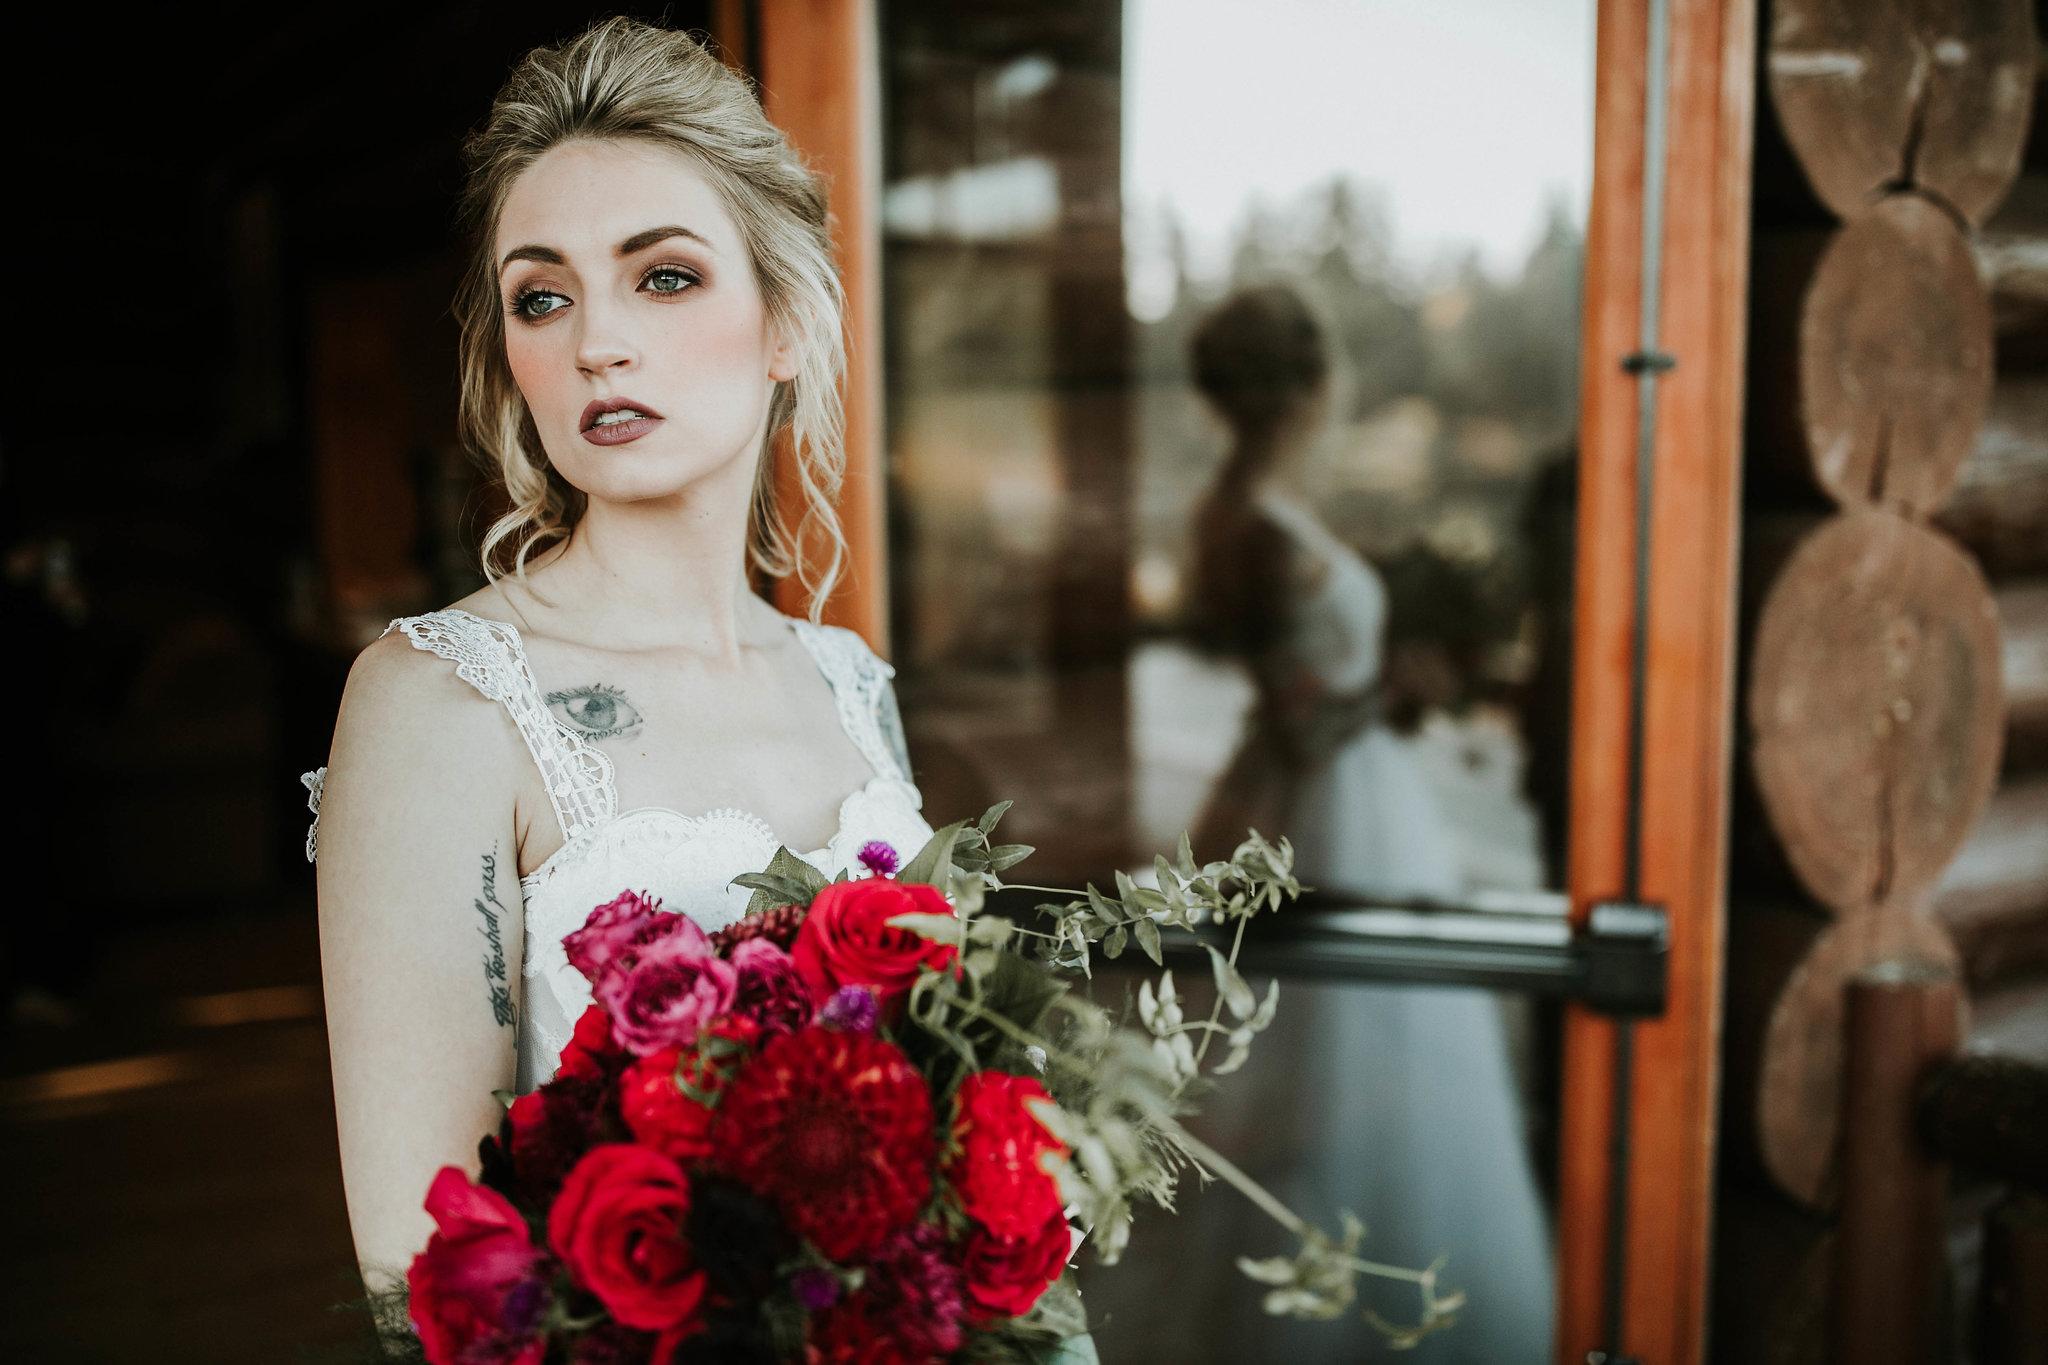 Crystal_Lake_lodge_Wedding_photos_by_Adina_Preston_Weddings_28.JPG